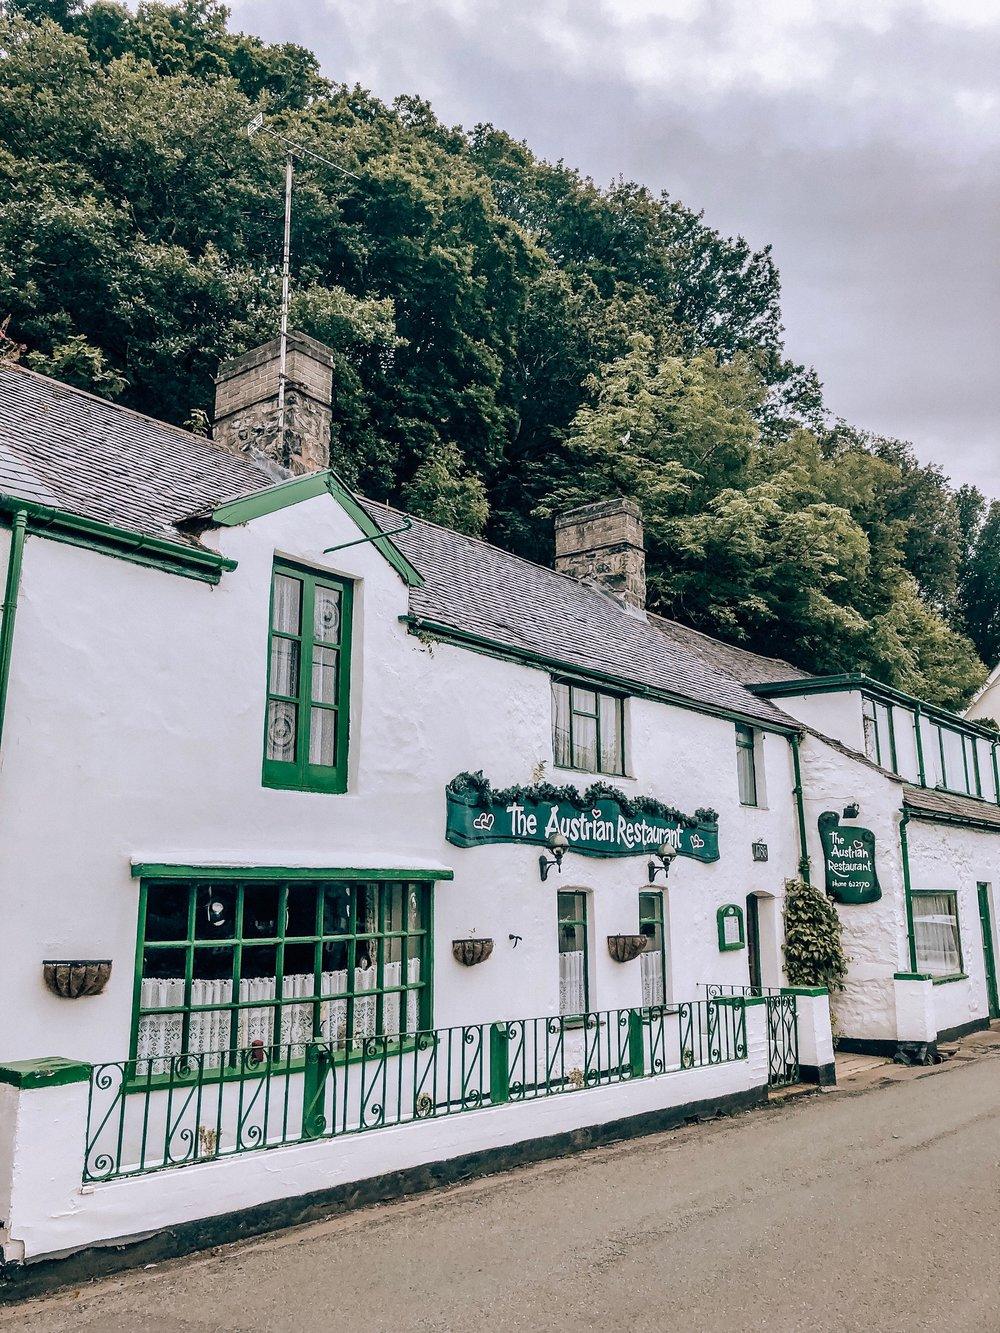 Austrian restaurant in Conwy Wales